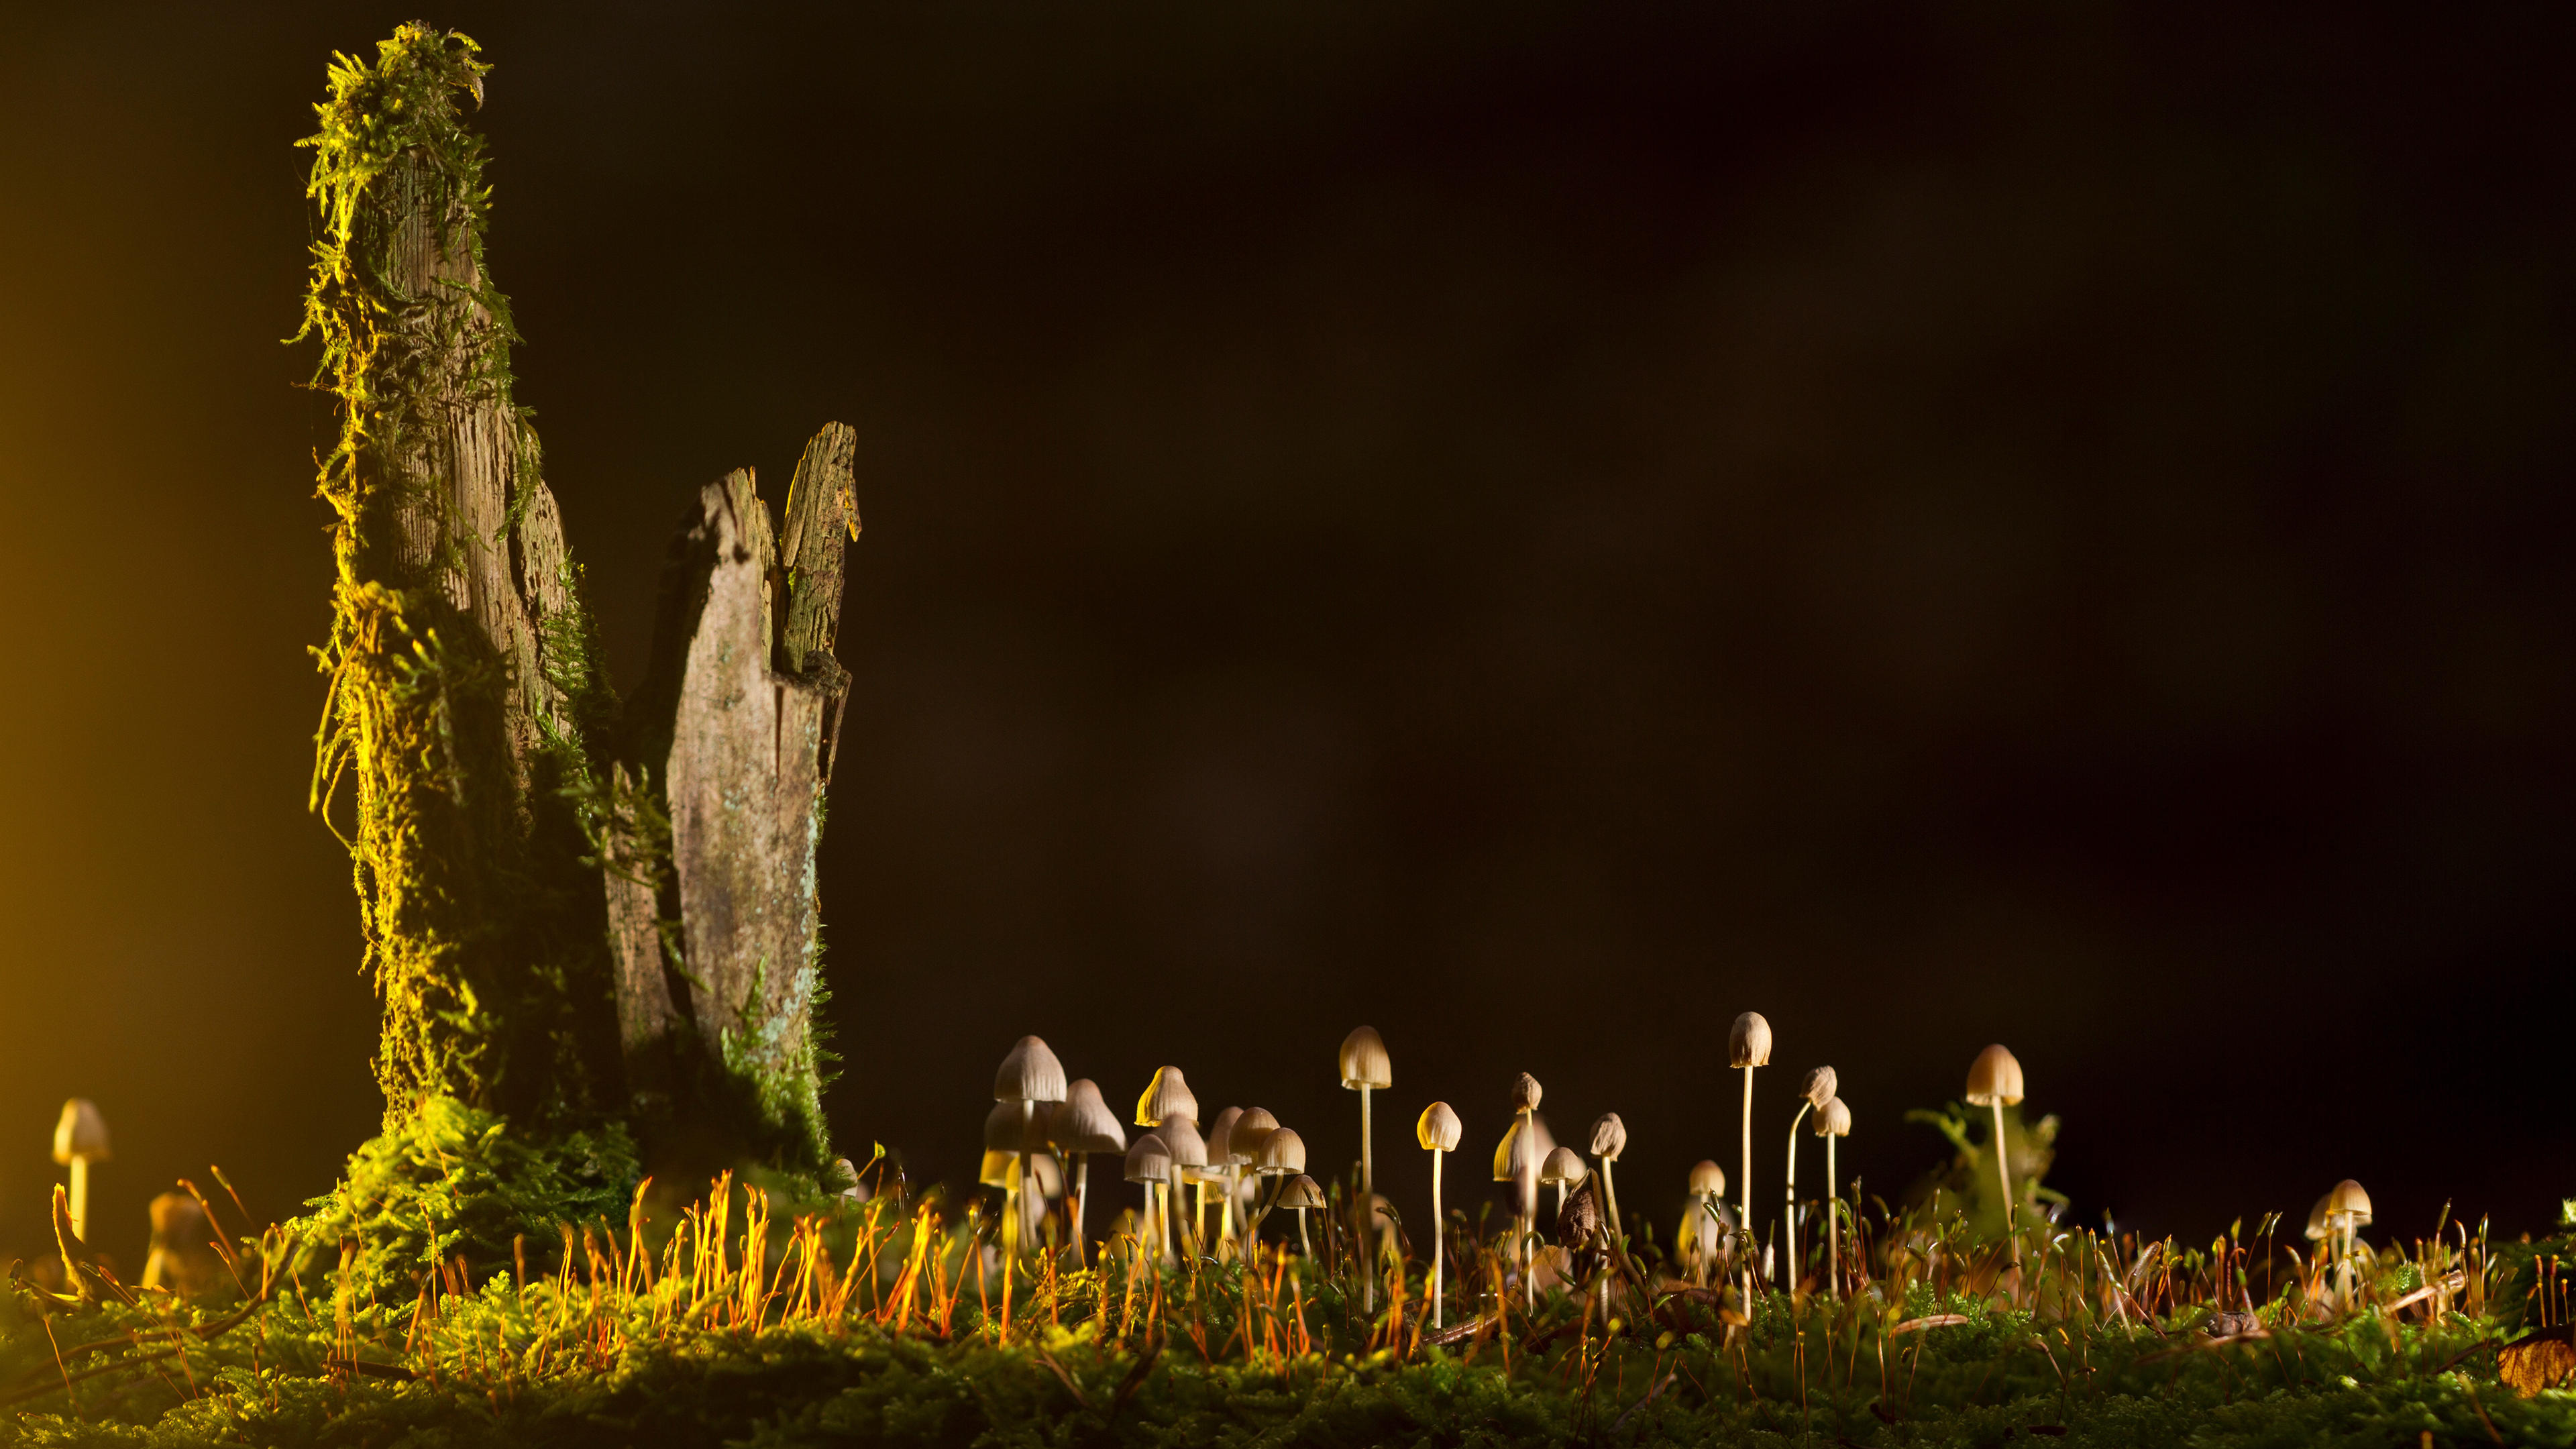 Mushrooms Desktop Background Uhd 4k 3840 X 2160 Px